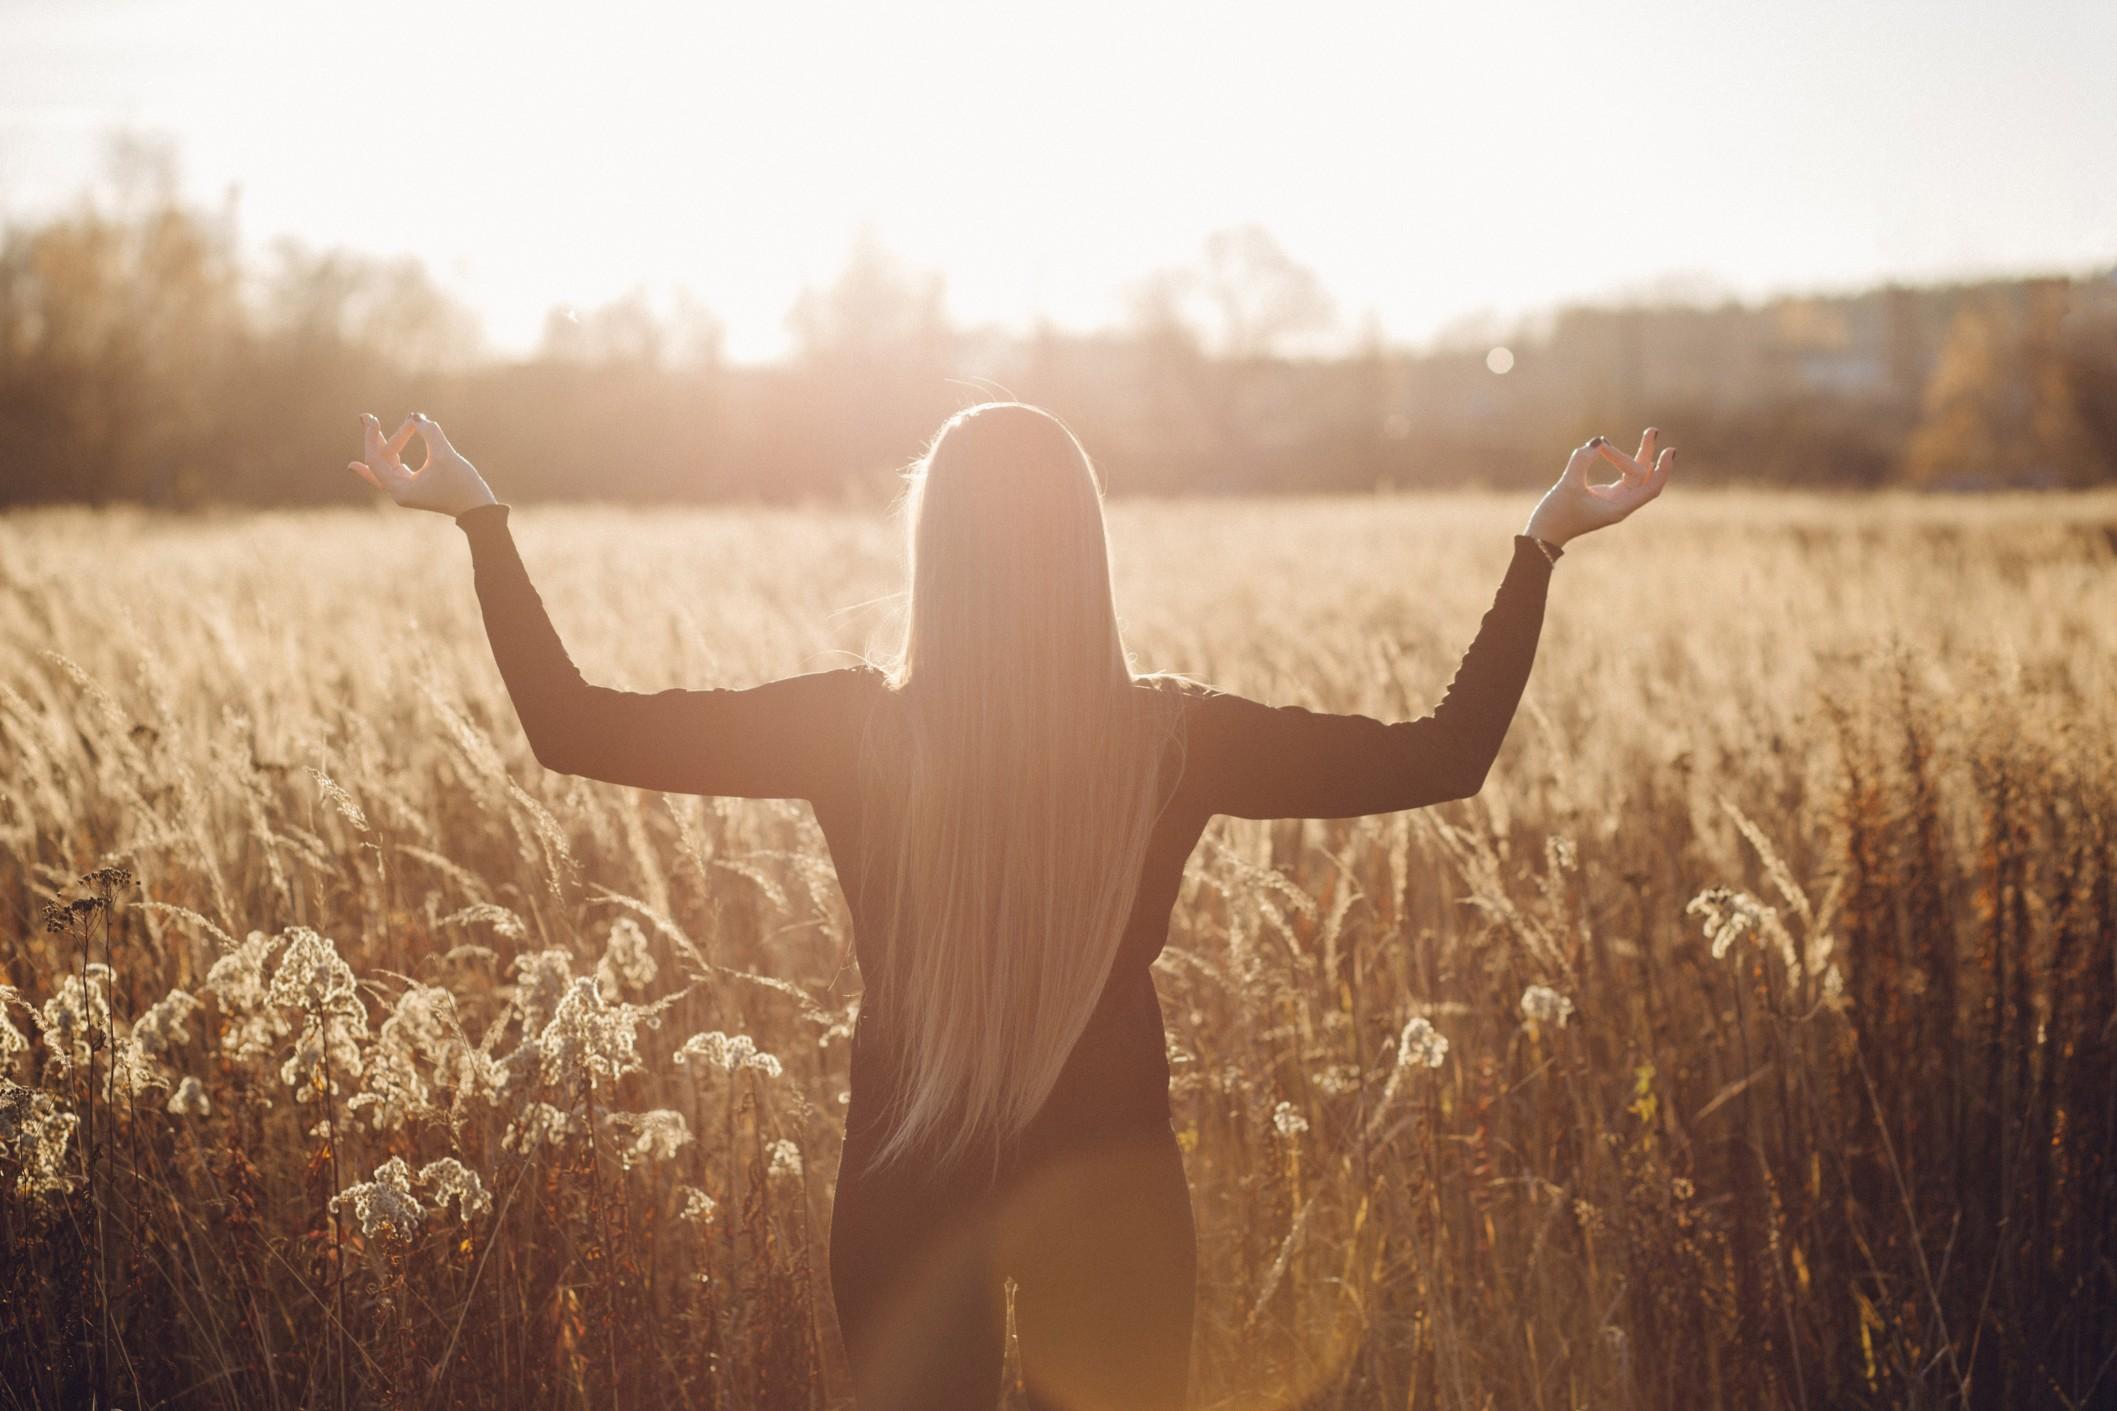 A woman soaking up the sun